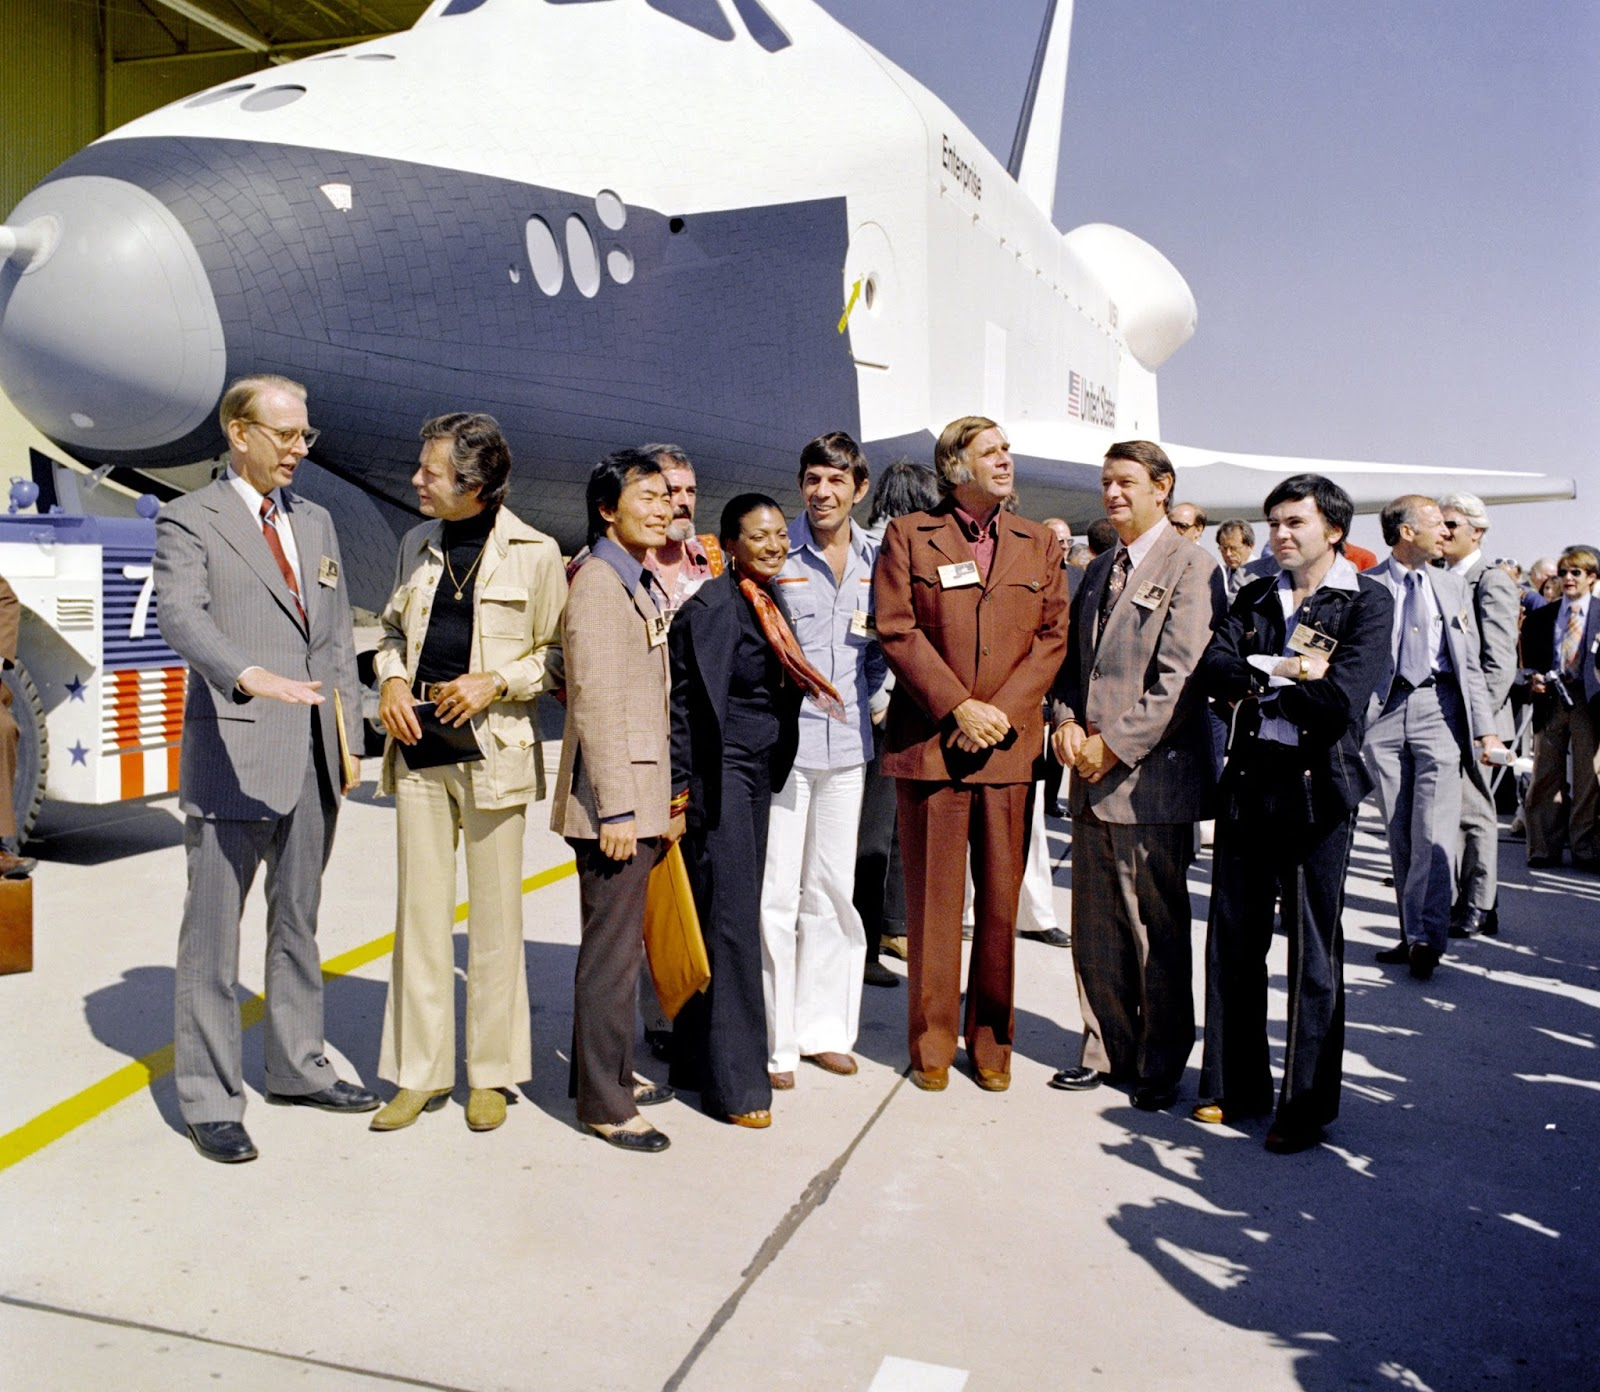 The crew of <em>Star Trek</em> gathers around space shuttle <em>Enterprise</em> in 1977.